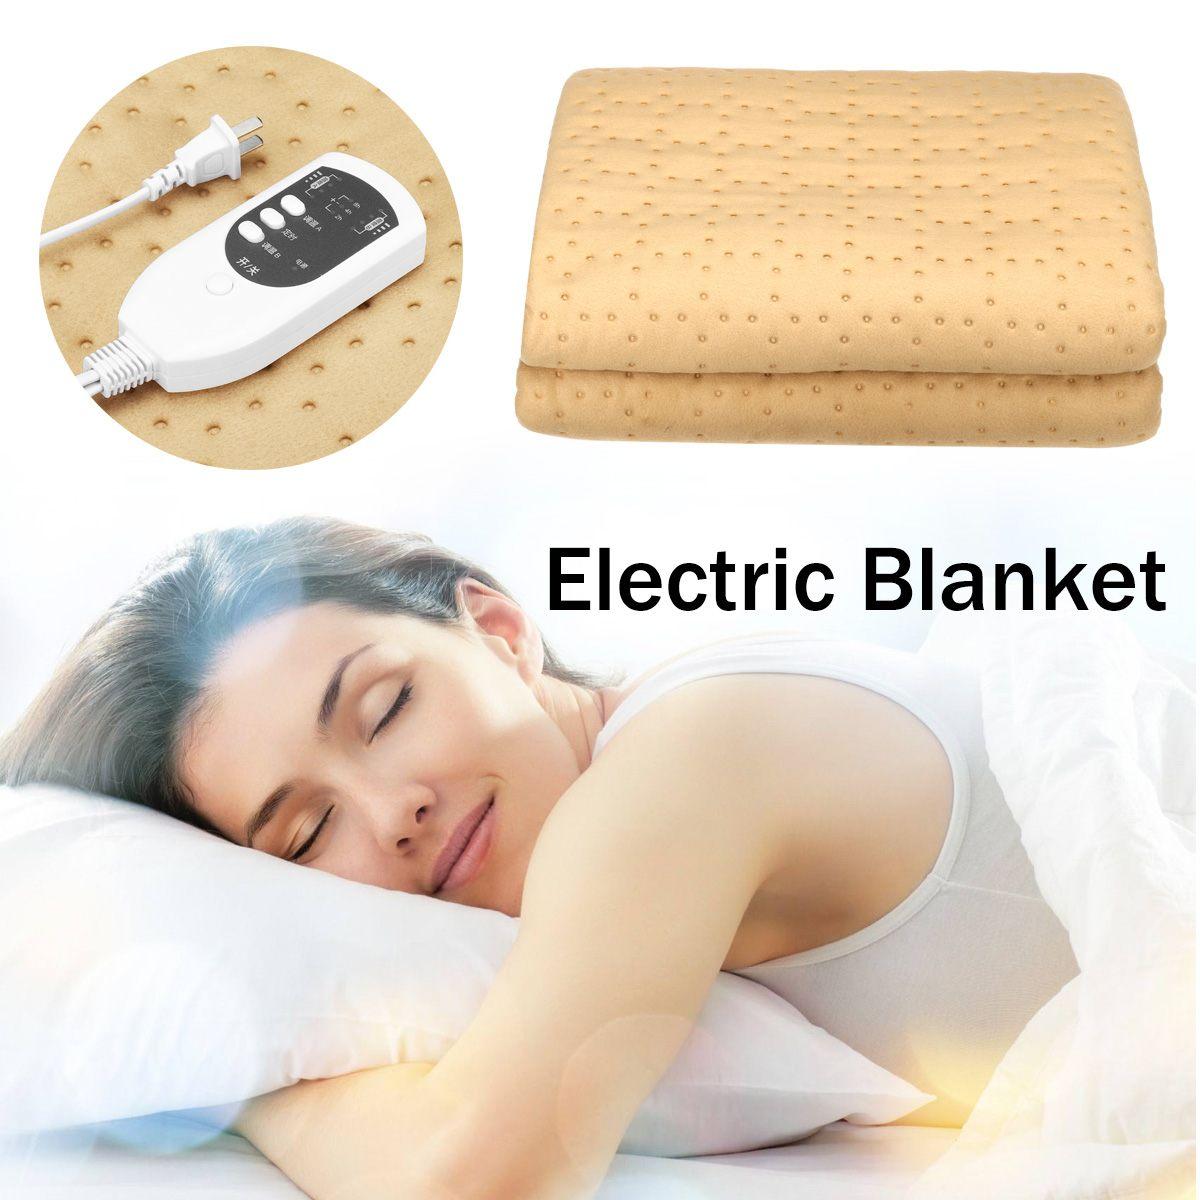 220V Bed Heater Mat Heating Pad Electric Blanket Bed Body Winter Warmer Carpet Electric Blanket Heated Blanket